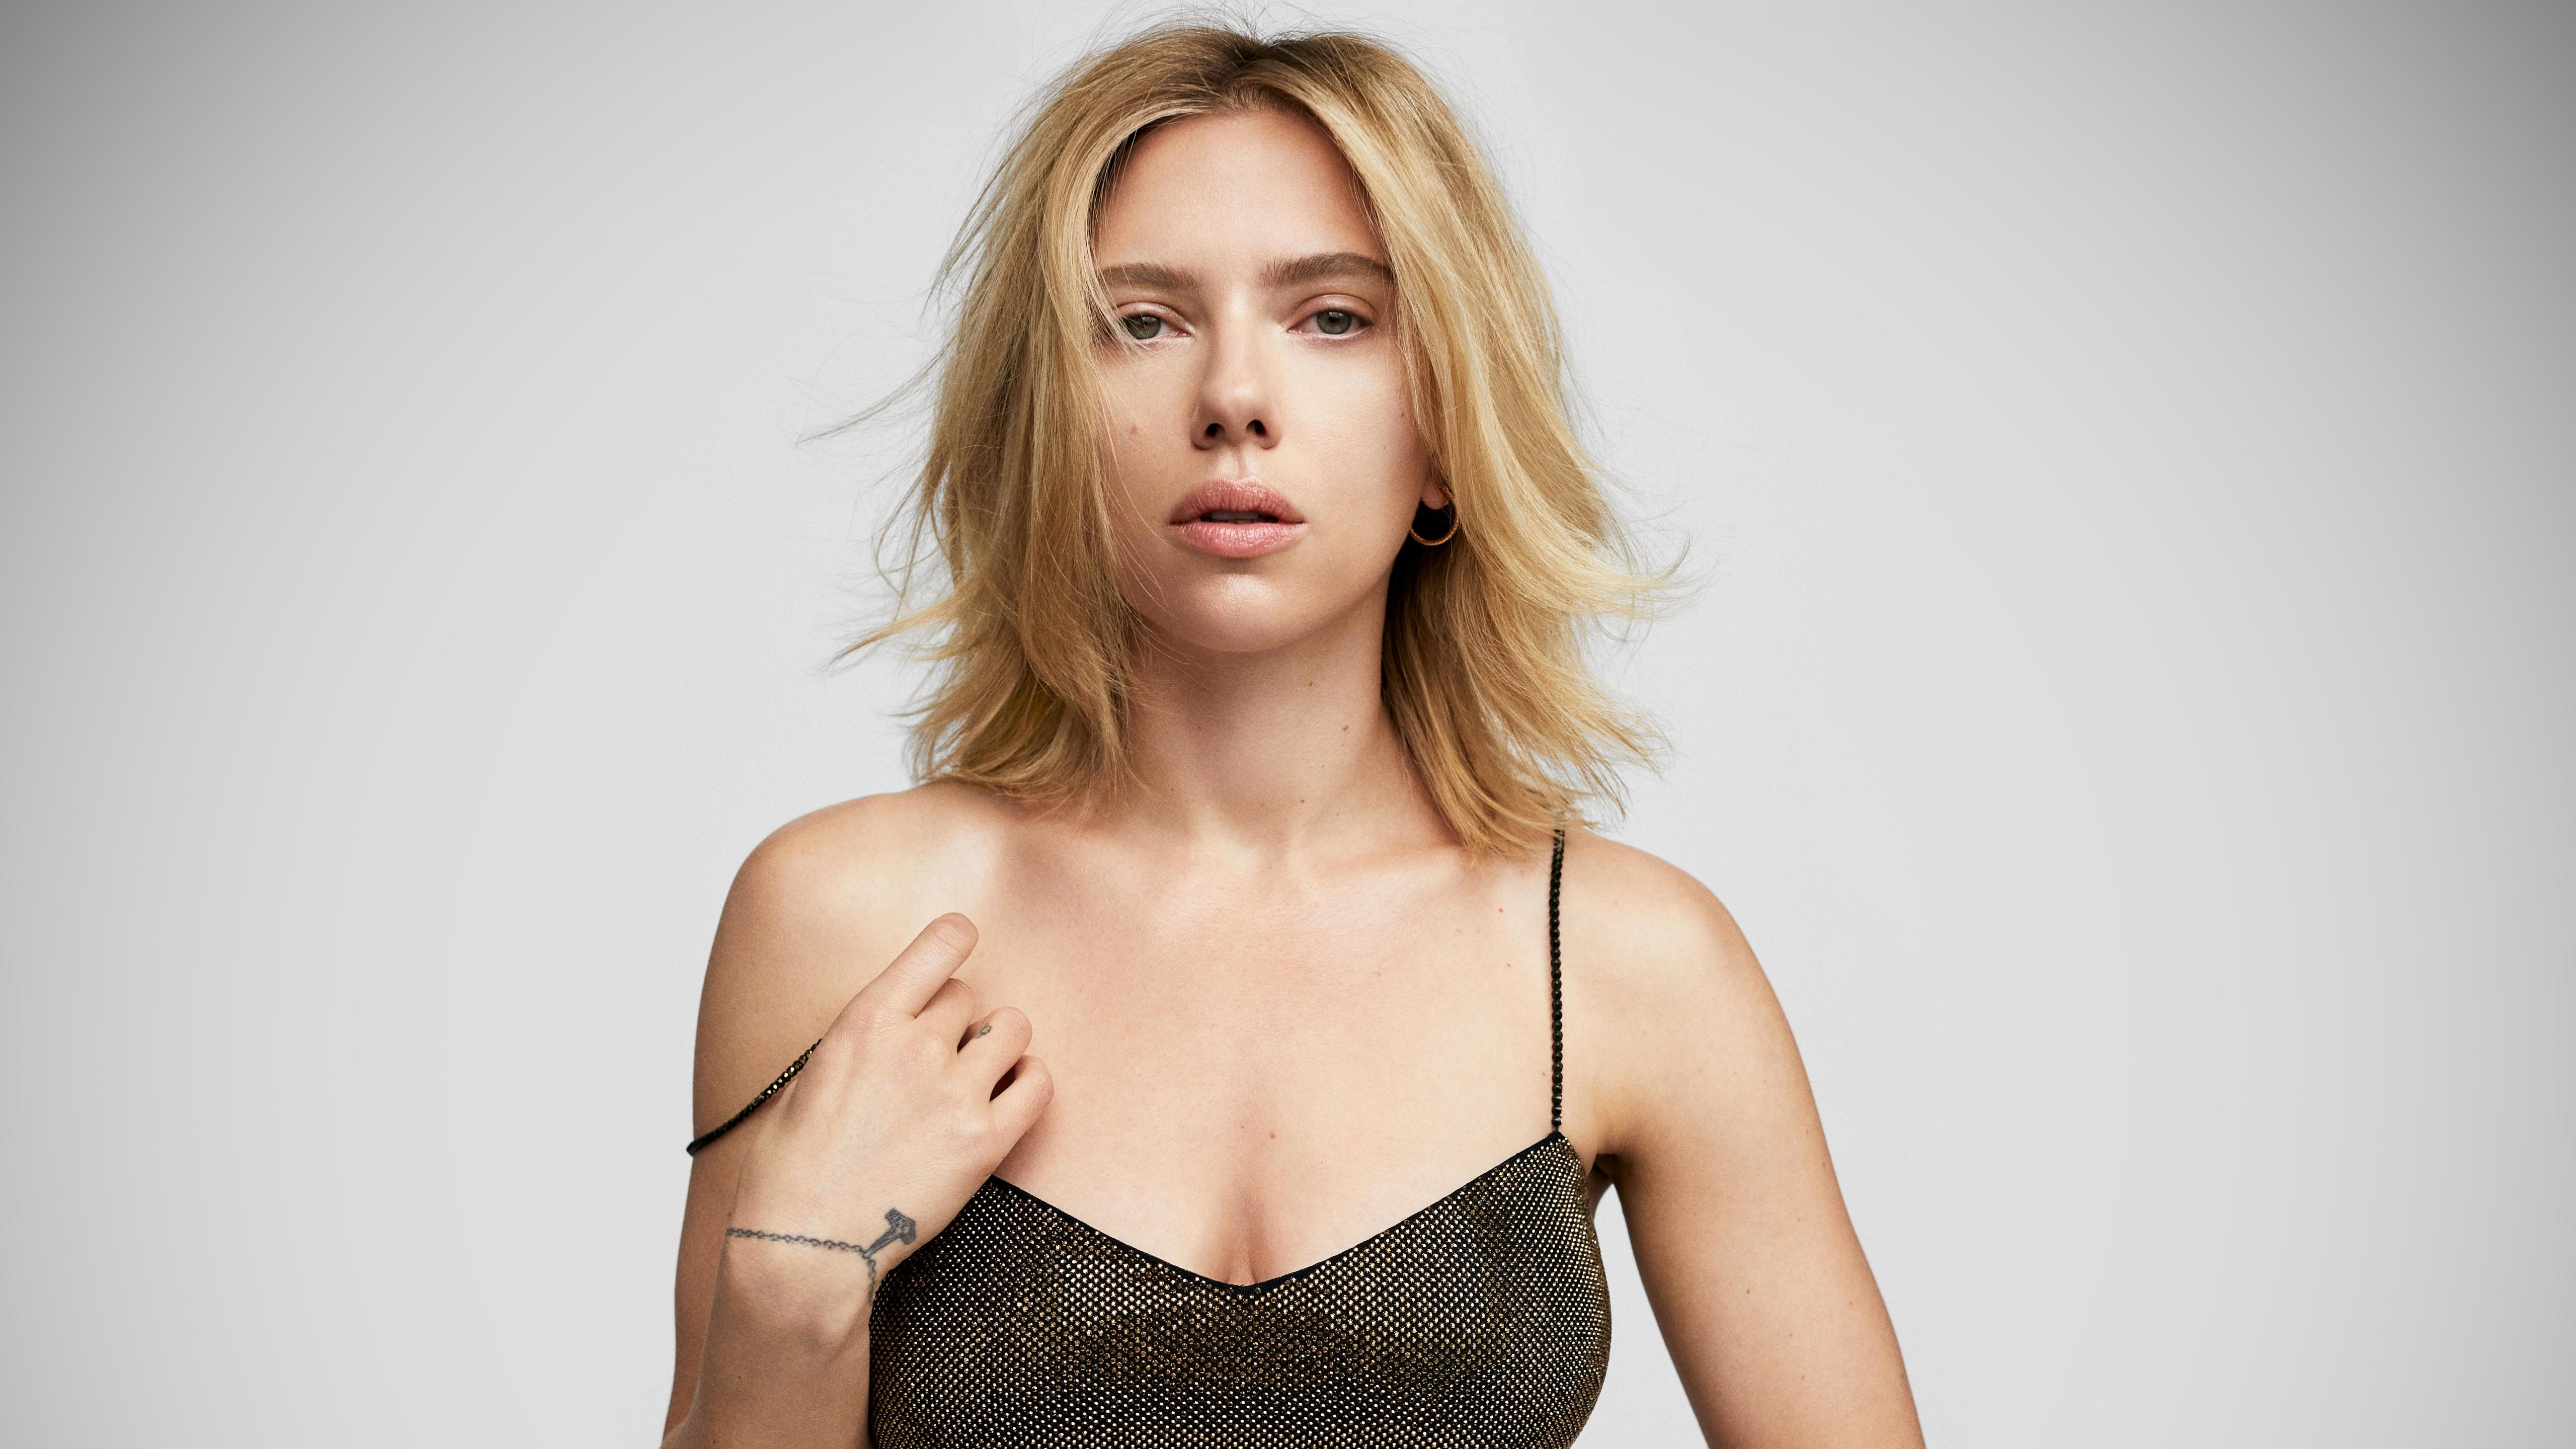 5120x2880 Scarlett Johansson 2020 5k Wallpaper Hd